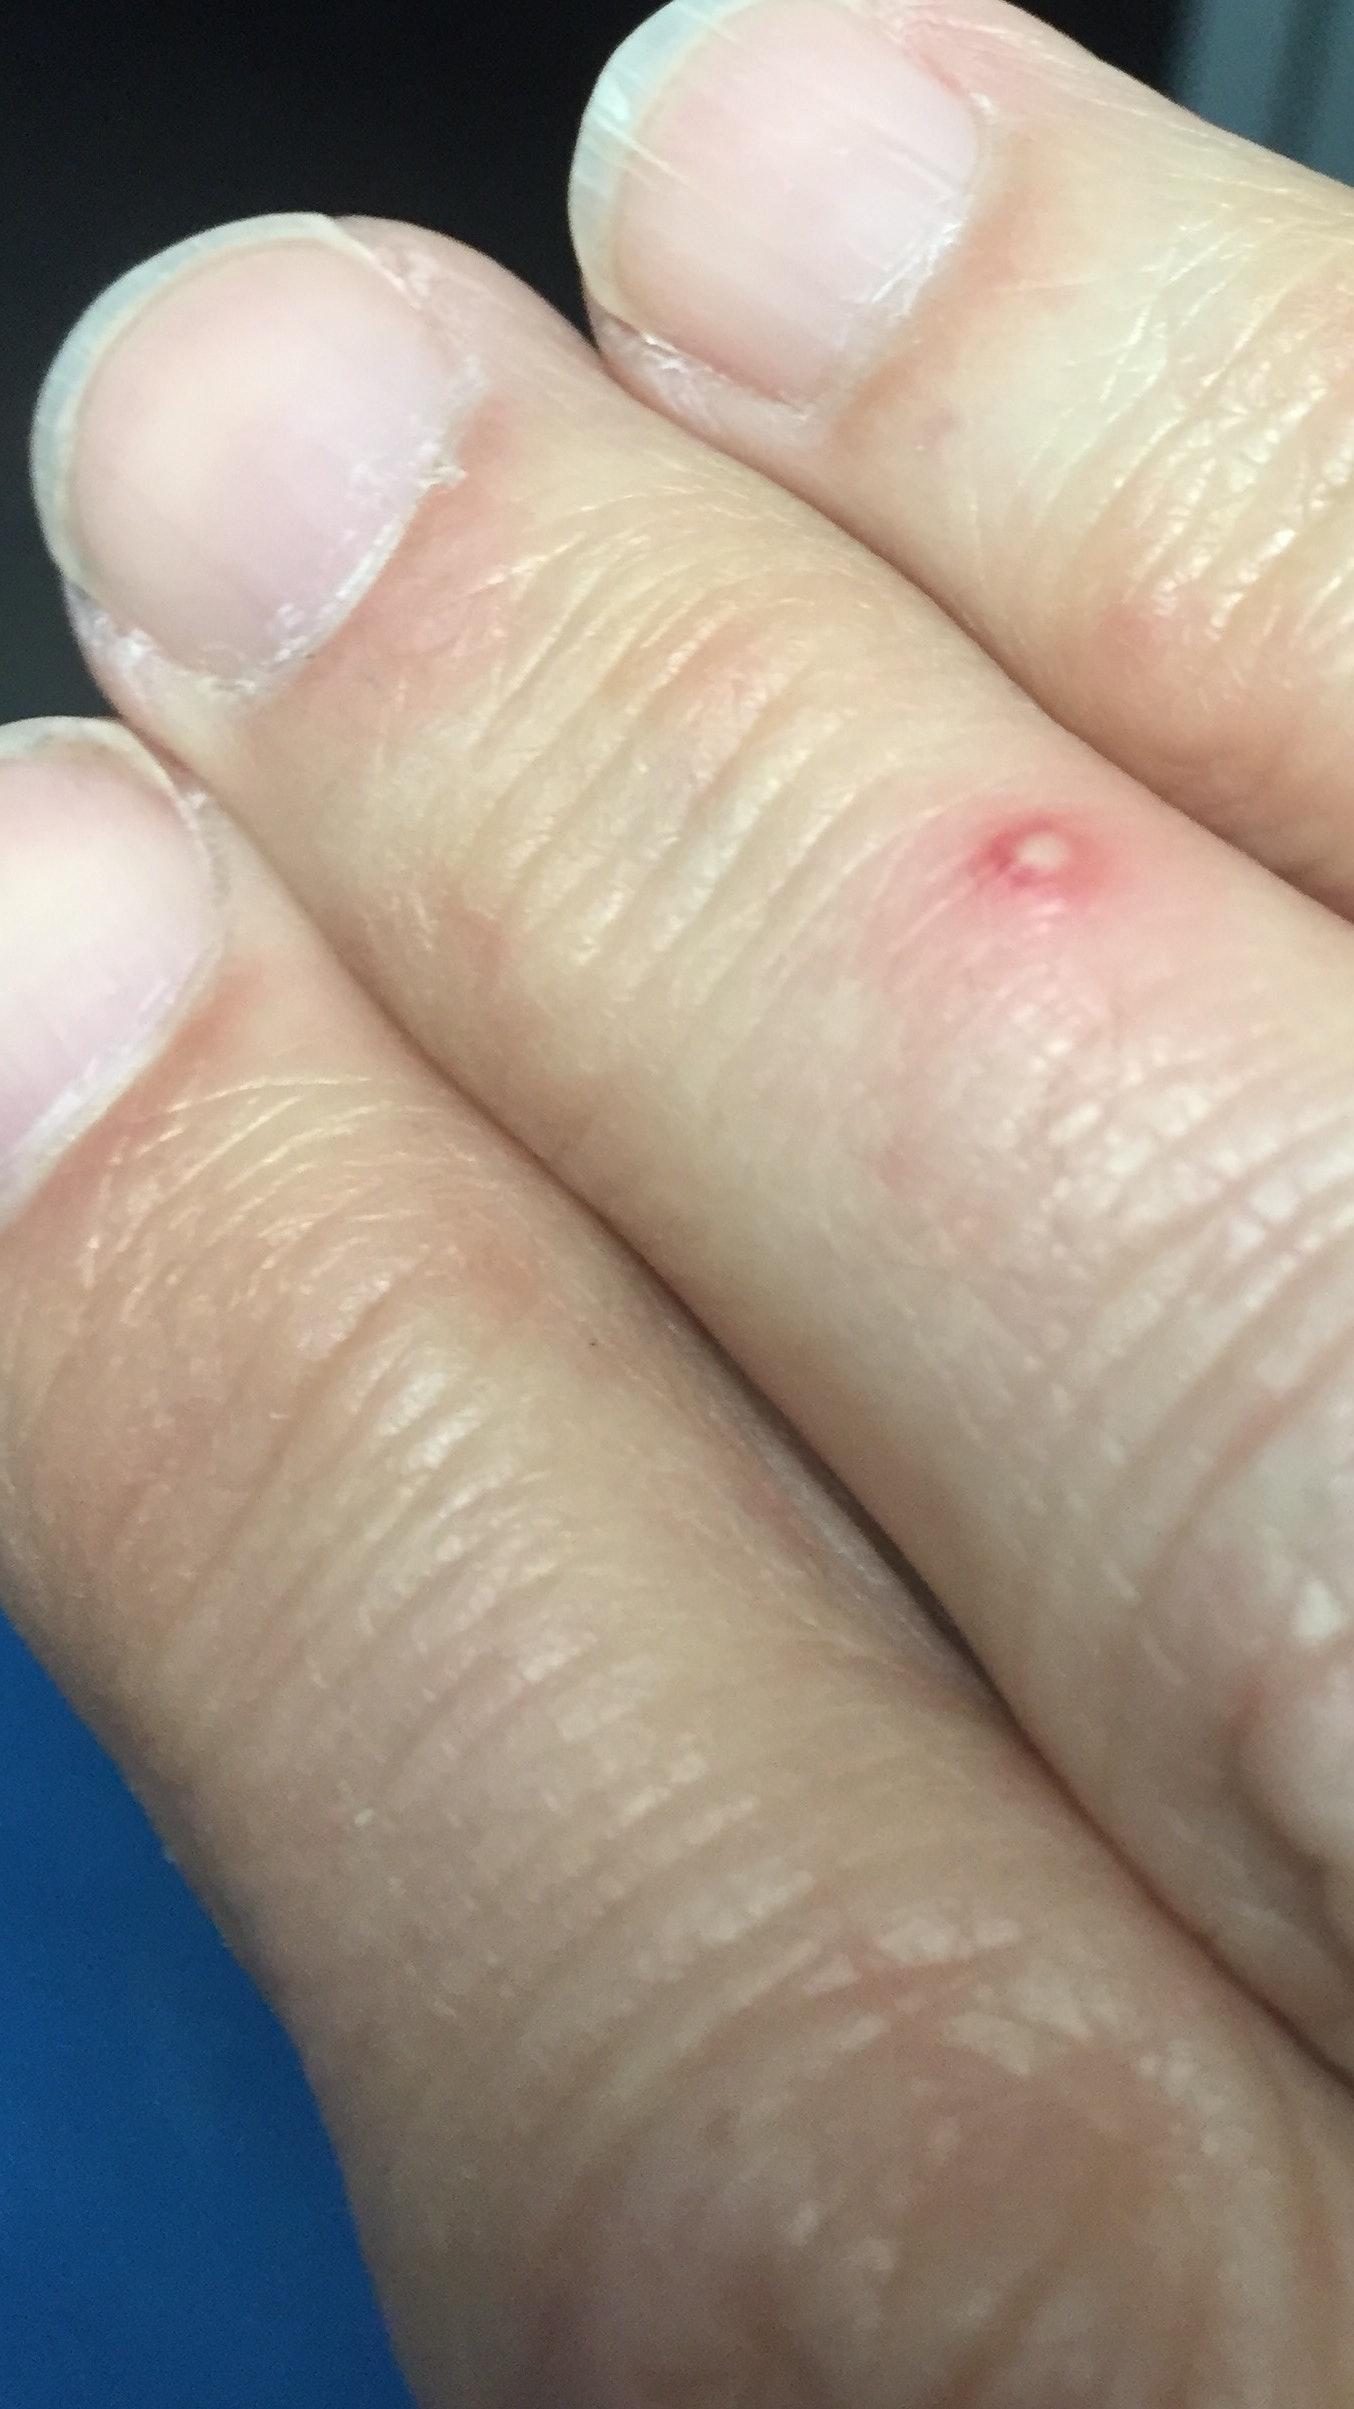 Pustule from Fire Ant bite